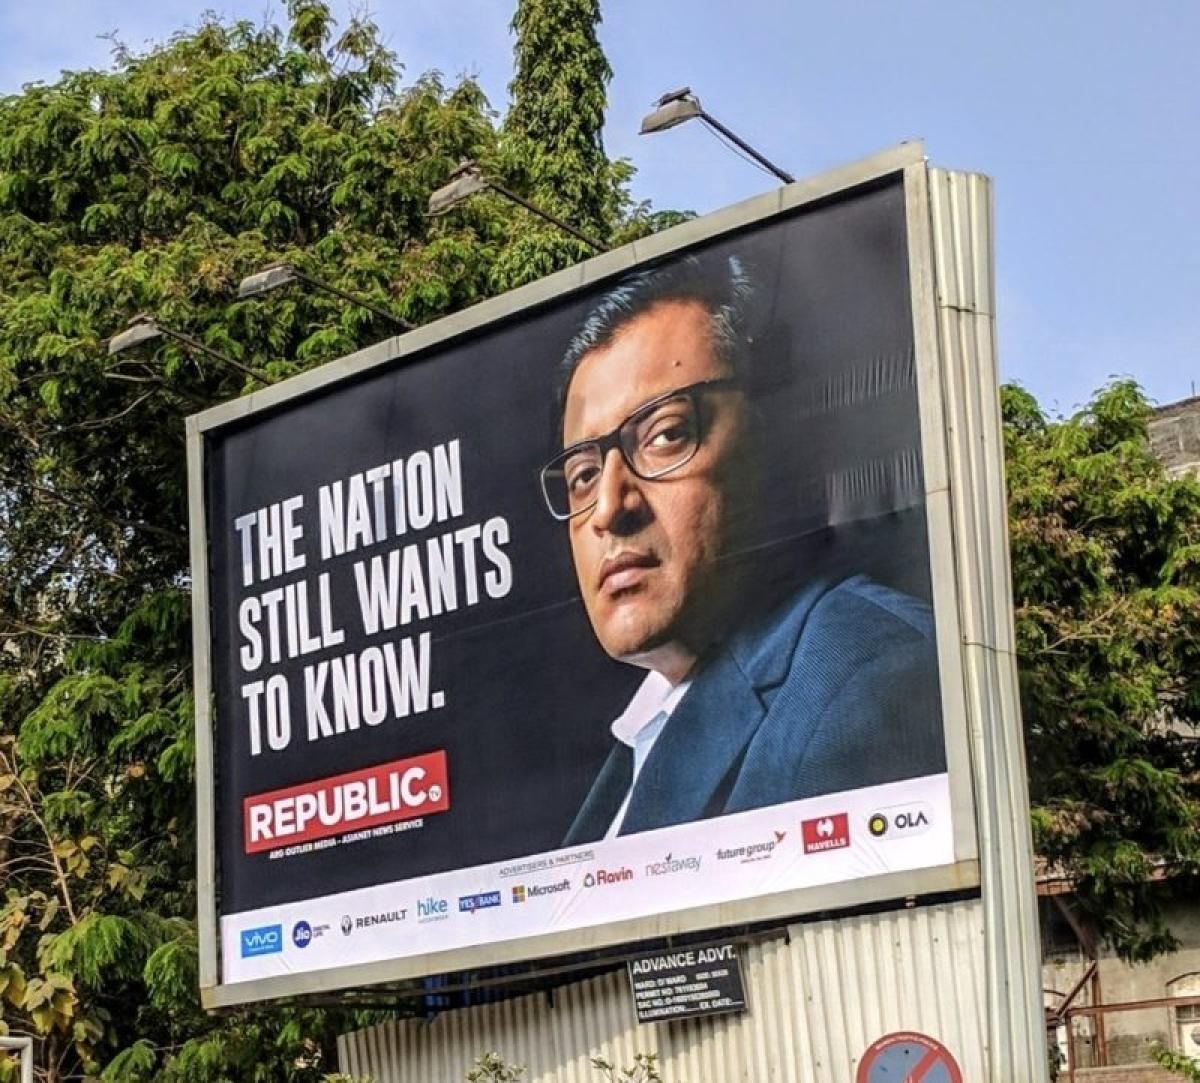 1,200 crore Republic: Arnab Goswani repurchases from Asianet News; Phoenix, Poovayya represent